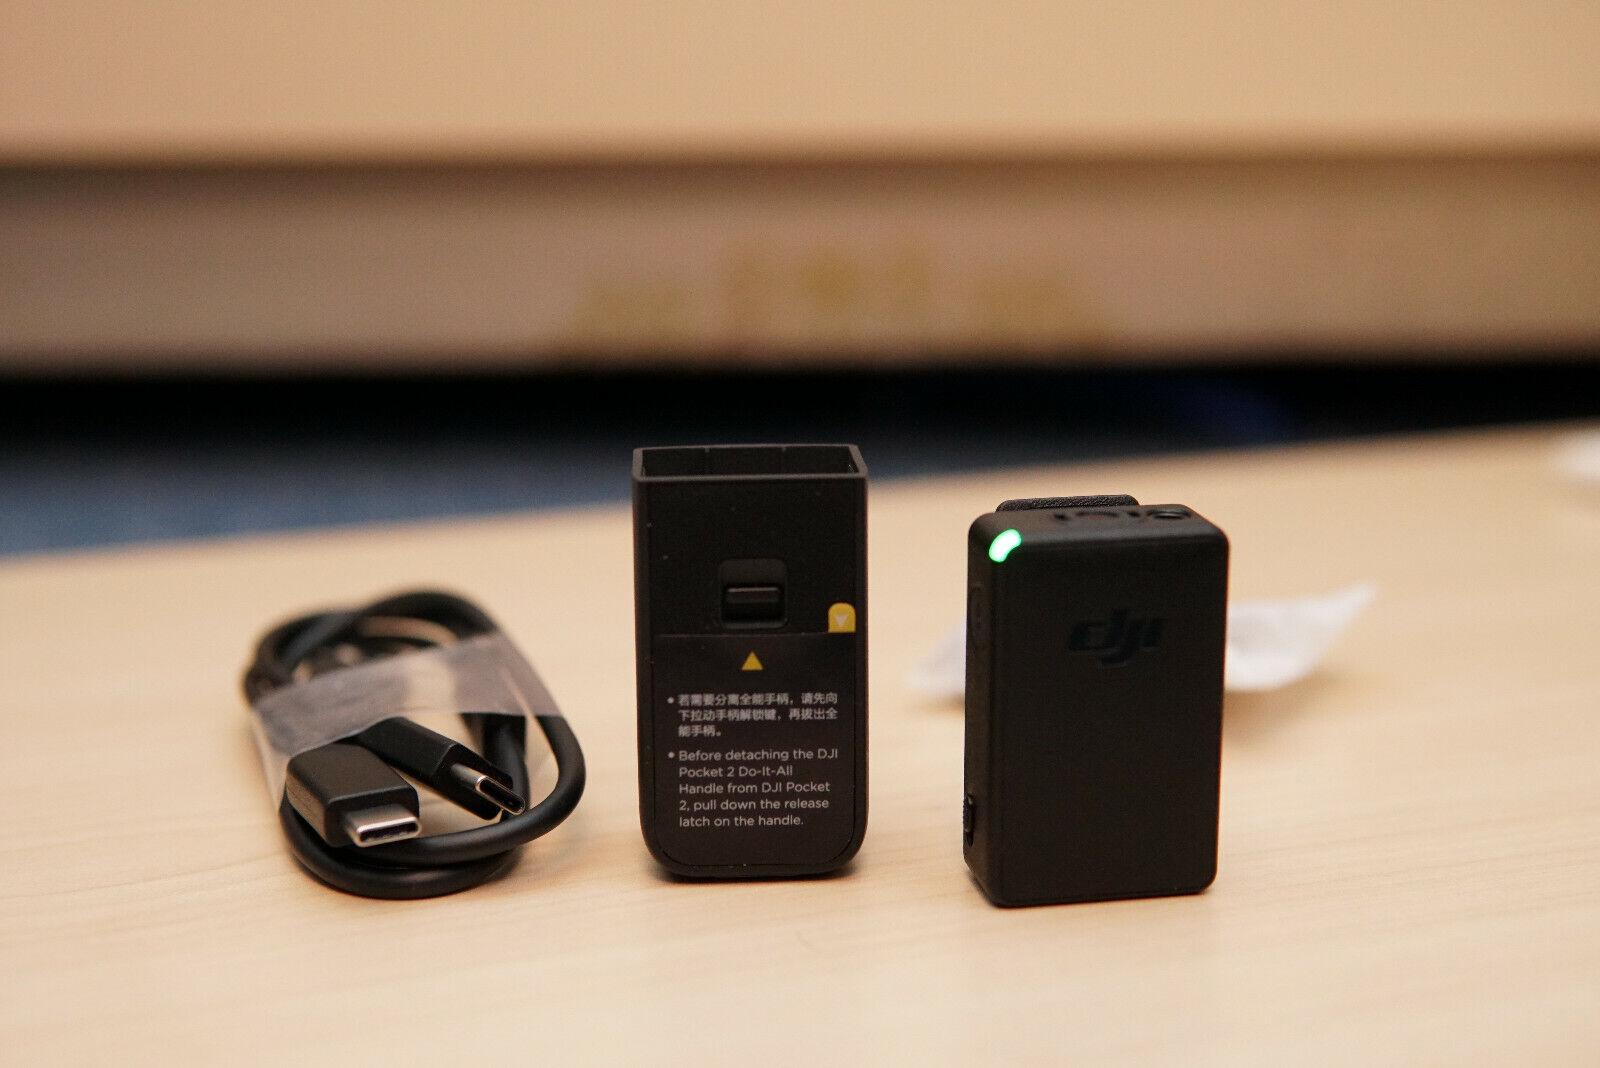 DJI Osmo Pocket 2 Do-It-All Handle + Wireless Microphone Transmitter